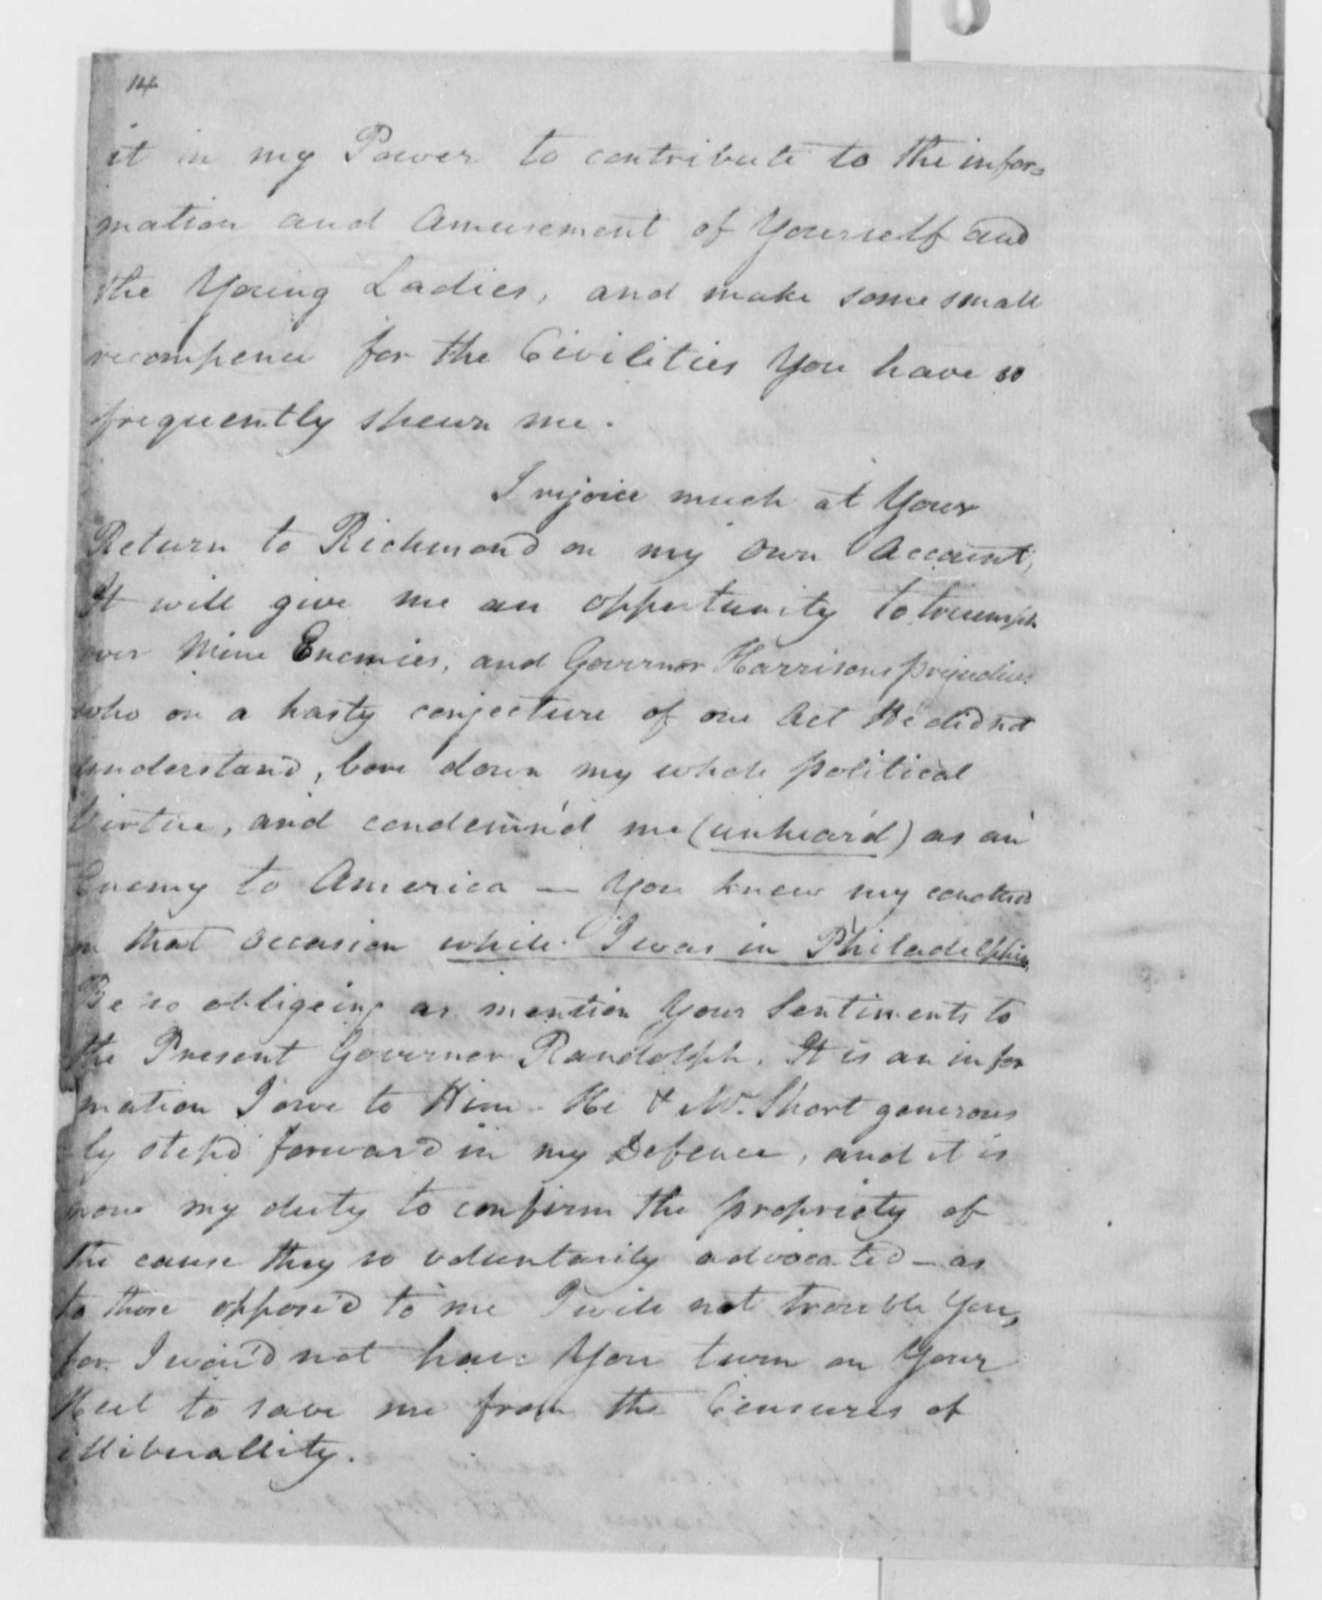 William Tatham to Thomas Jefferson, December 1789